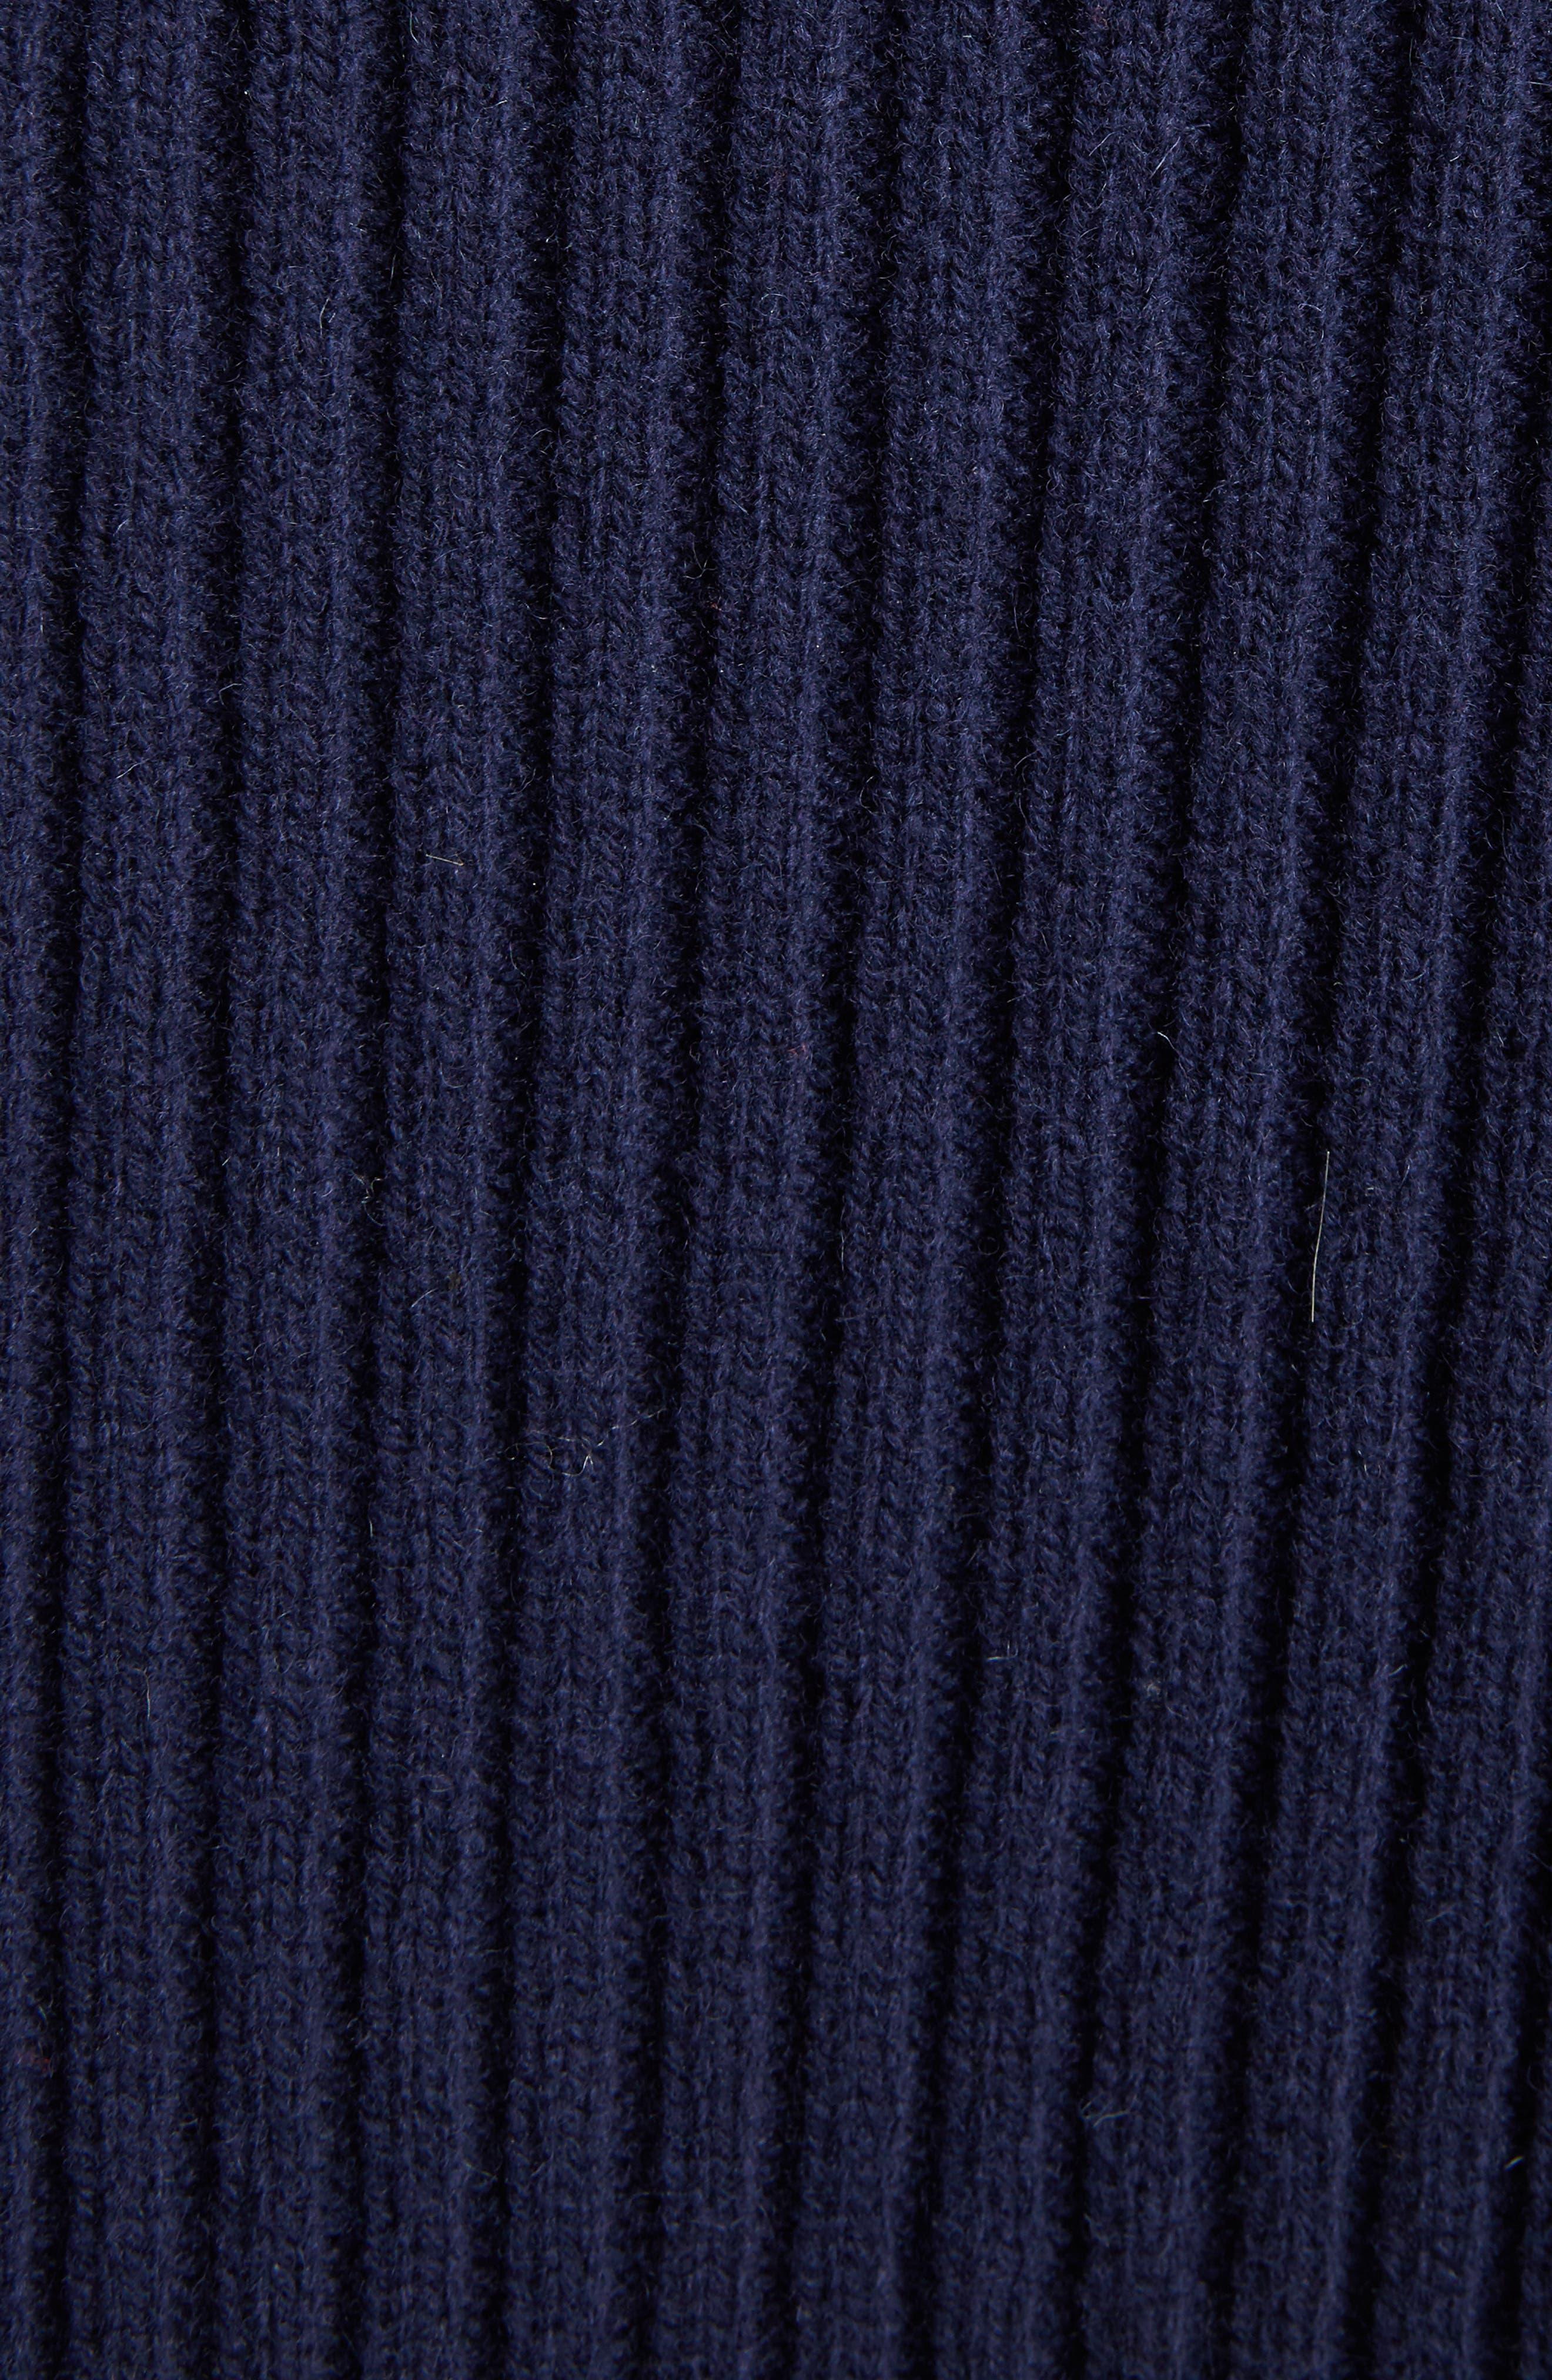 Sleeveless Turtleneck Sweater,                             Alternate thumbnail 5, color,                             410